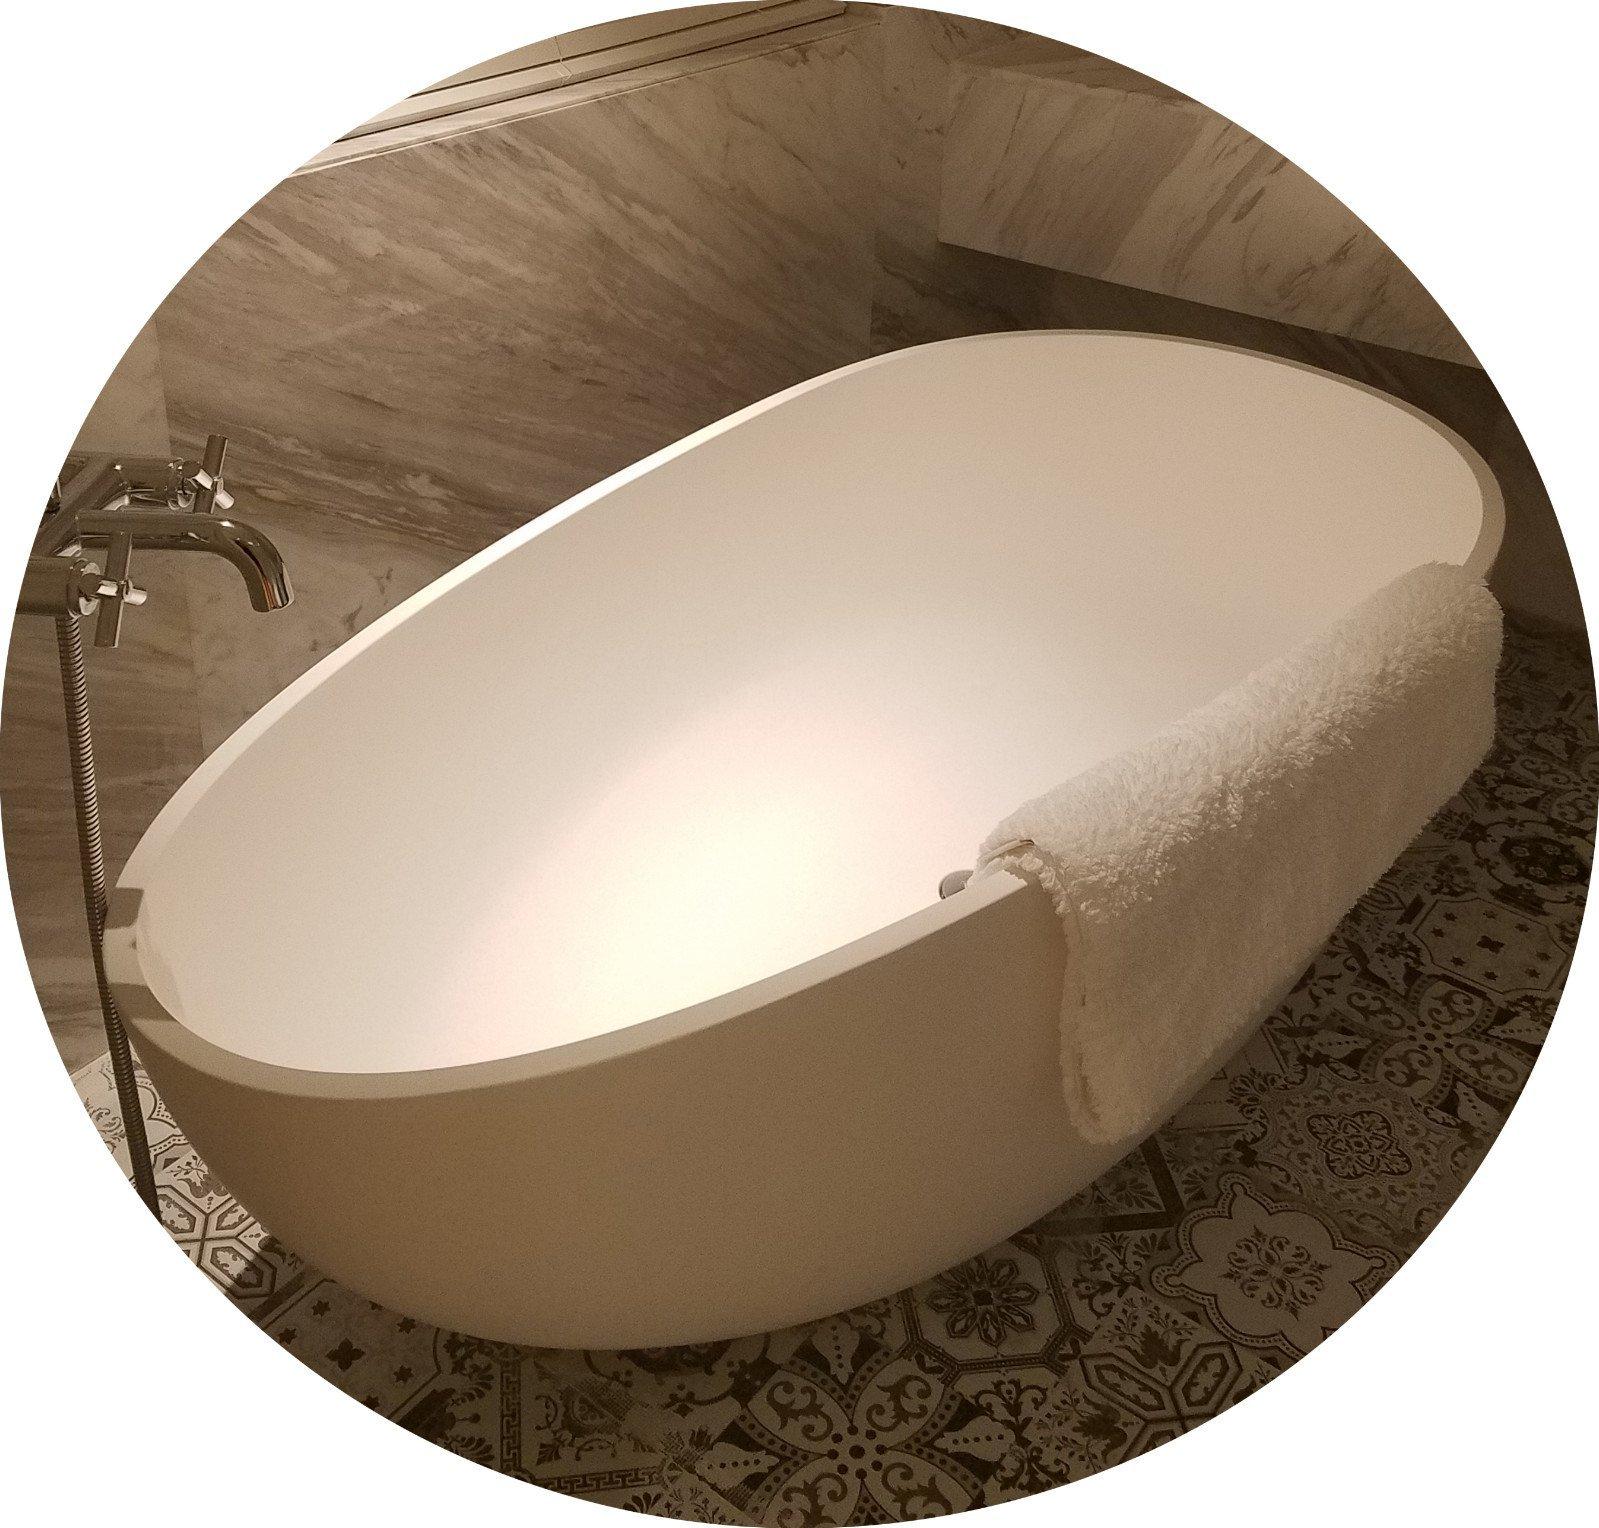 Wholesale designer 60 freestanding bathtub Bella Brand